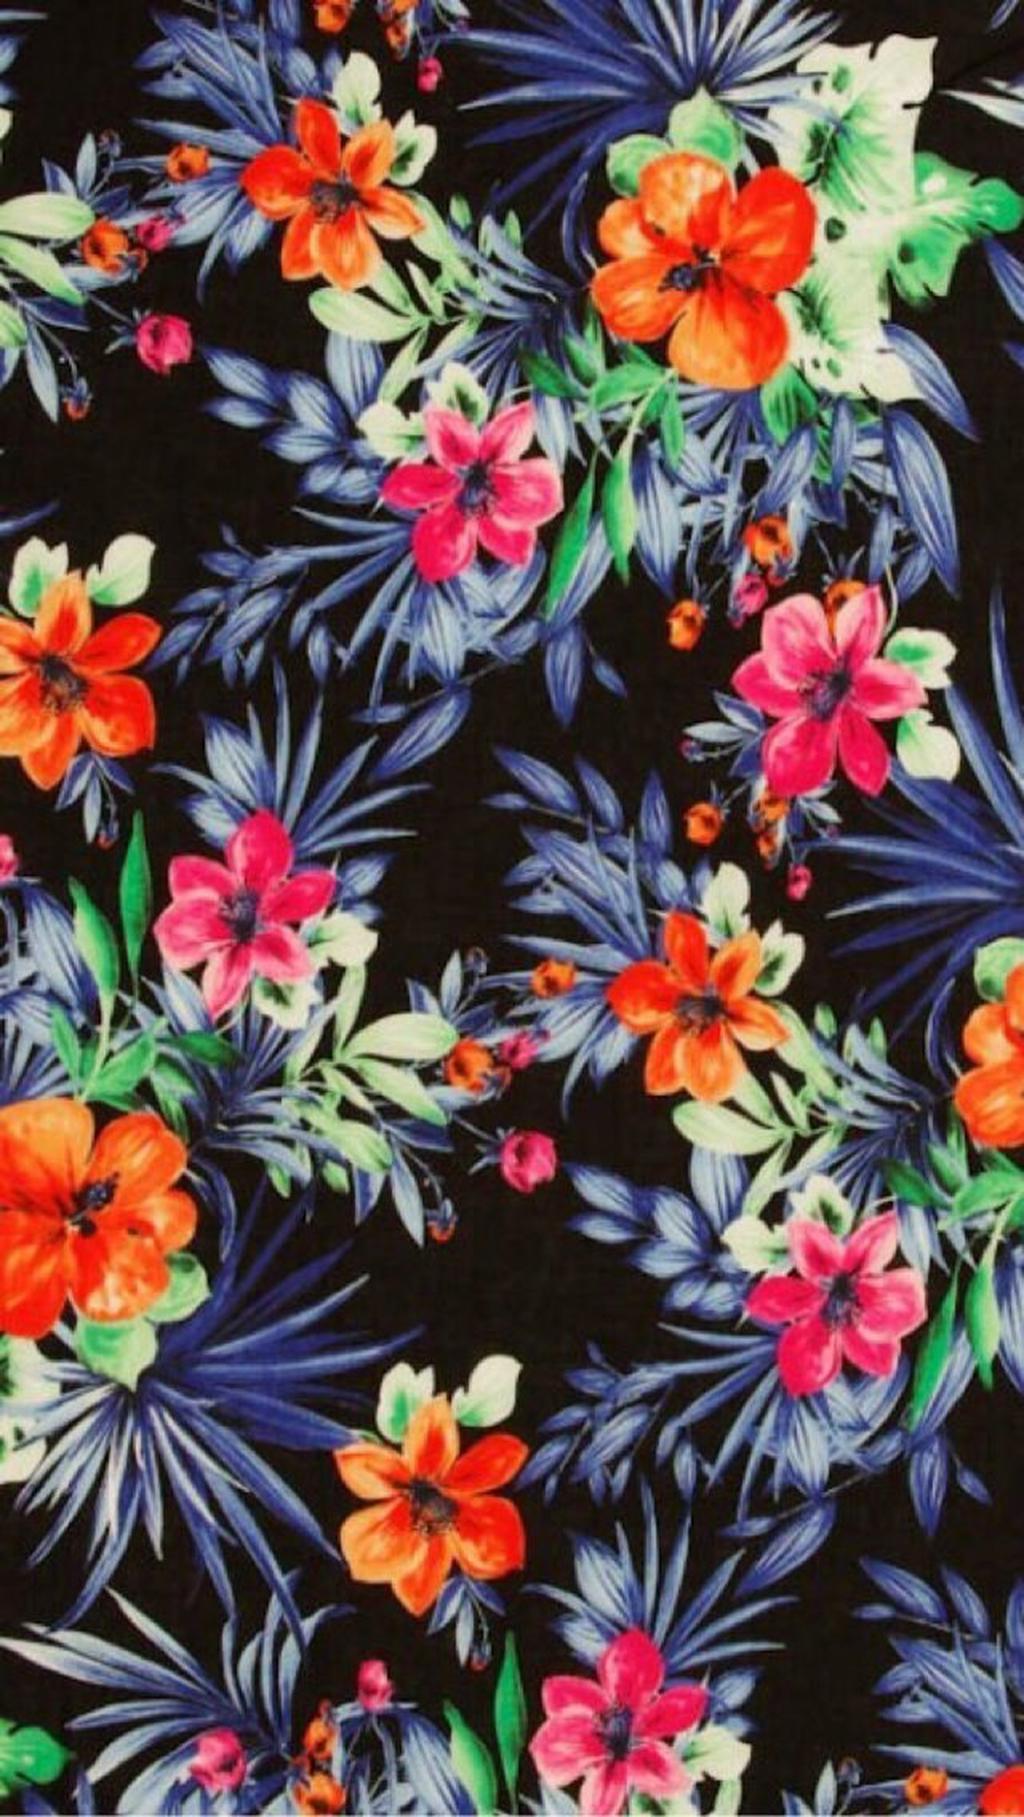 Hawaii Print Iphone Wallpapers Top Free Hawaii Print